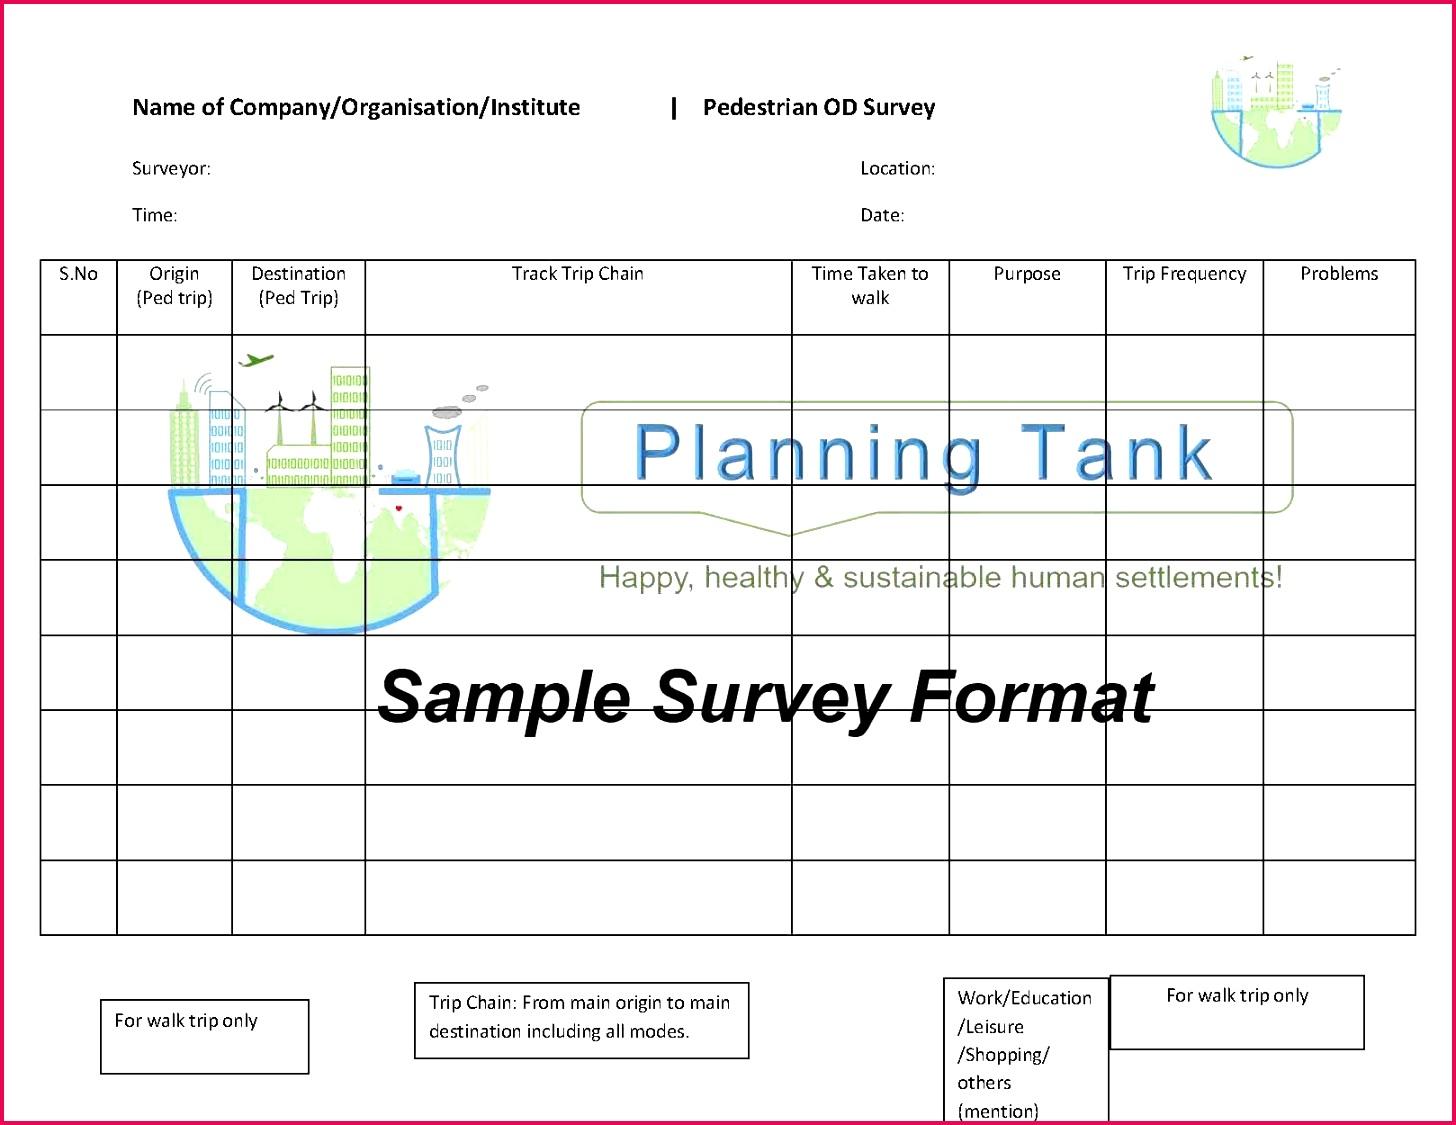 microsoft office resume templates free new microsoft fice certificate templates free best word diagram